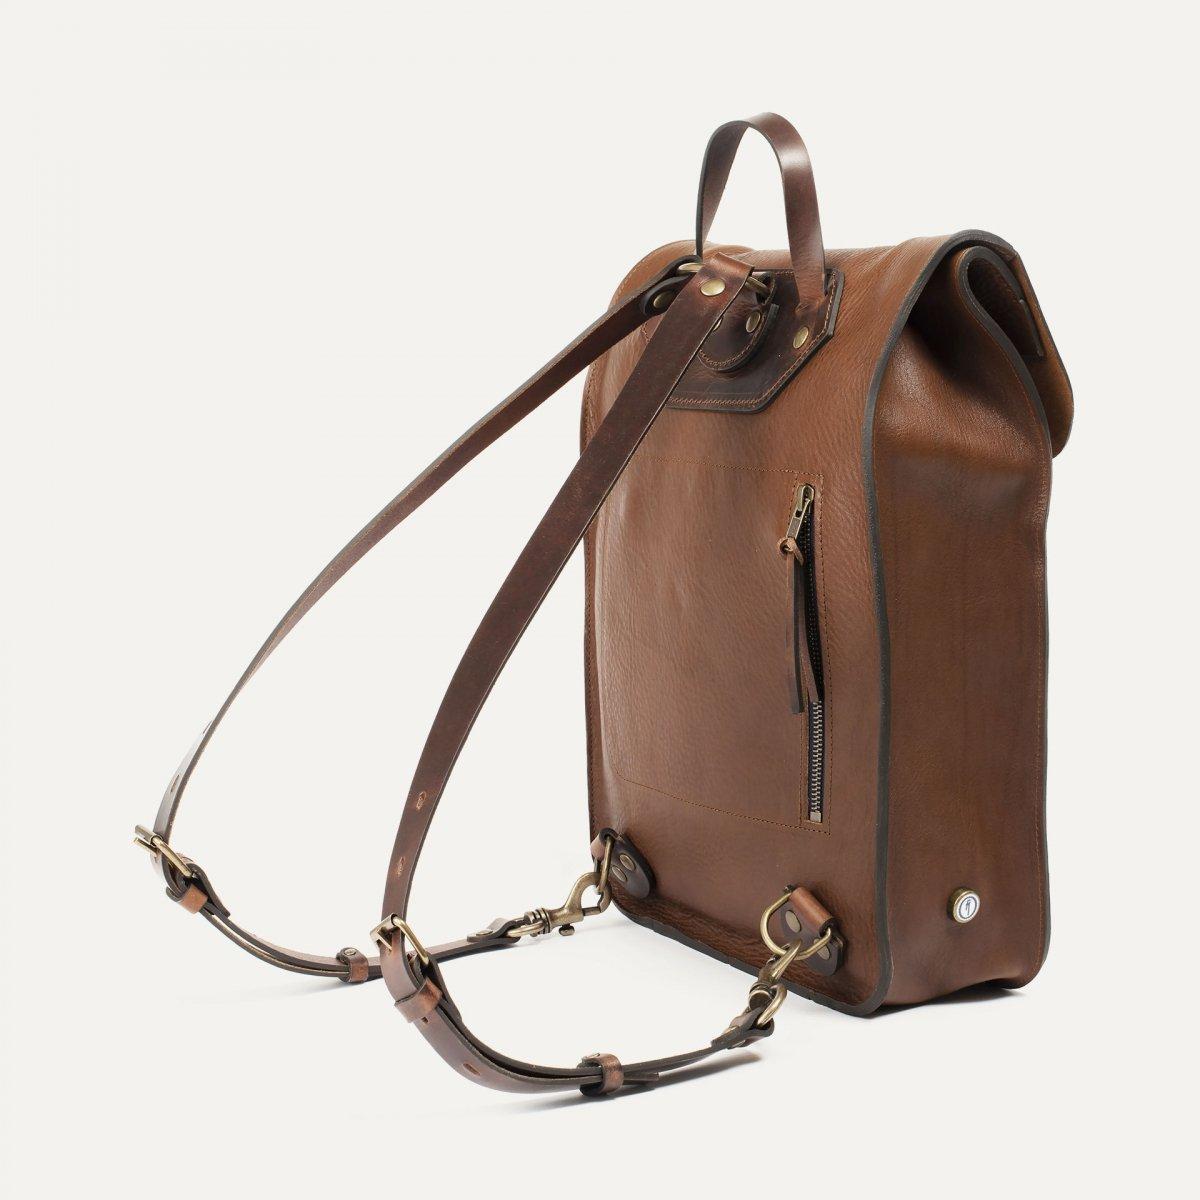 Puncho leather backpack - Cuba Libre / E Pure (image n°3)